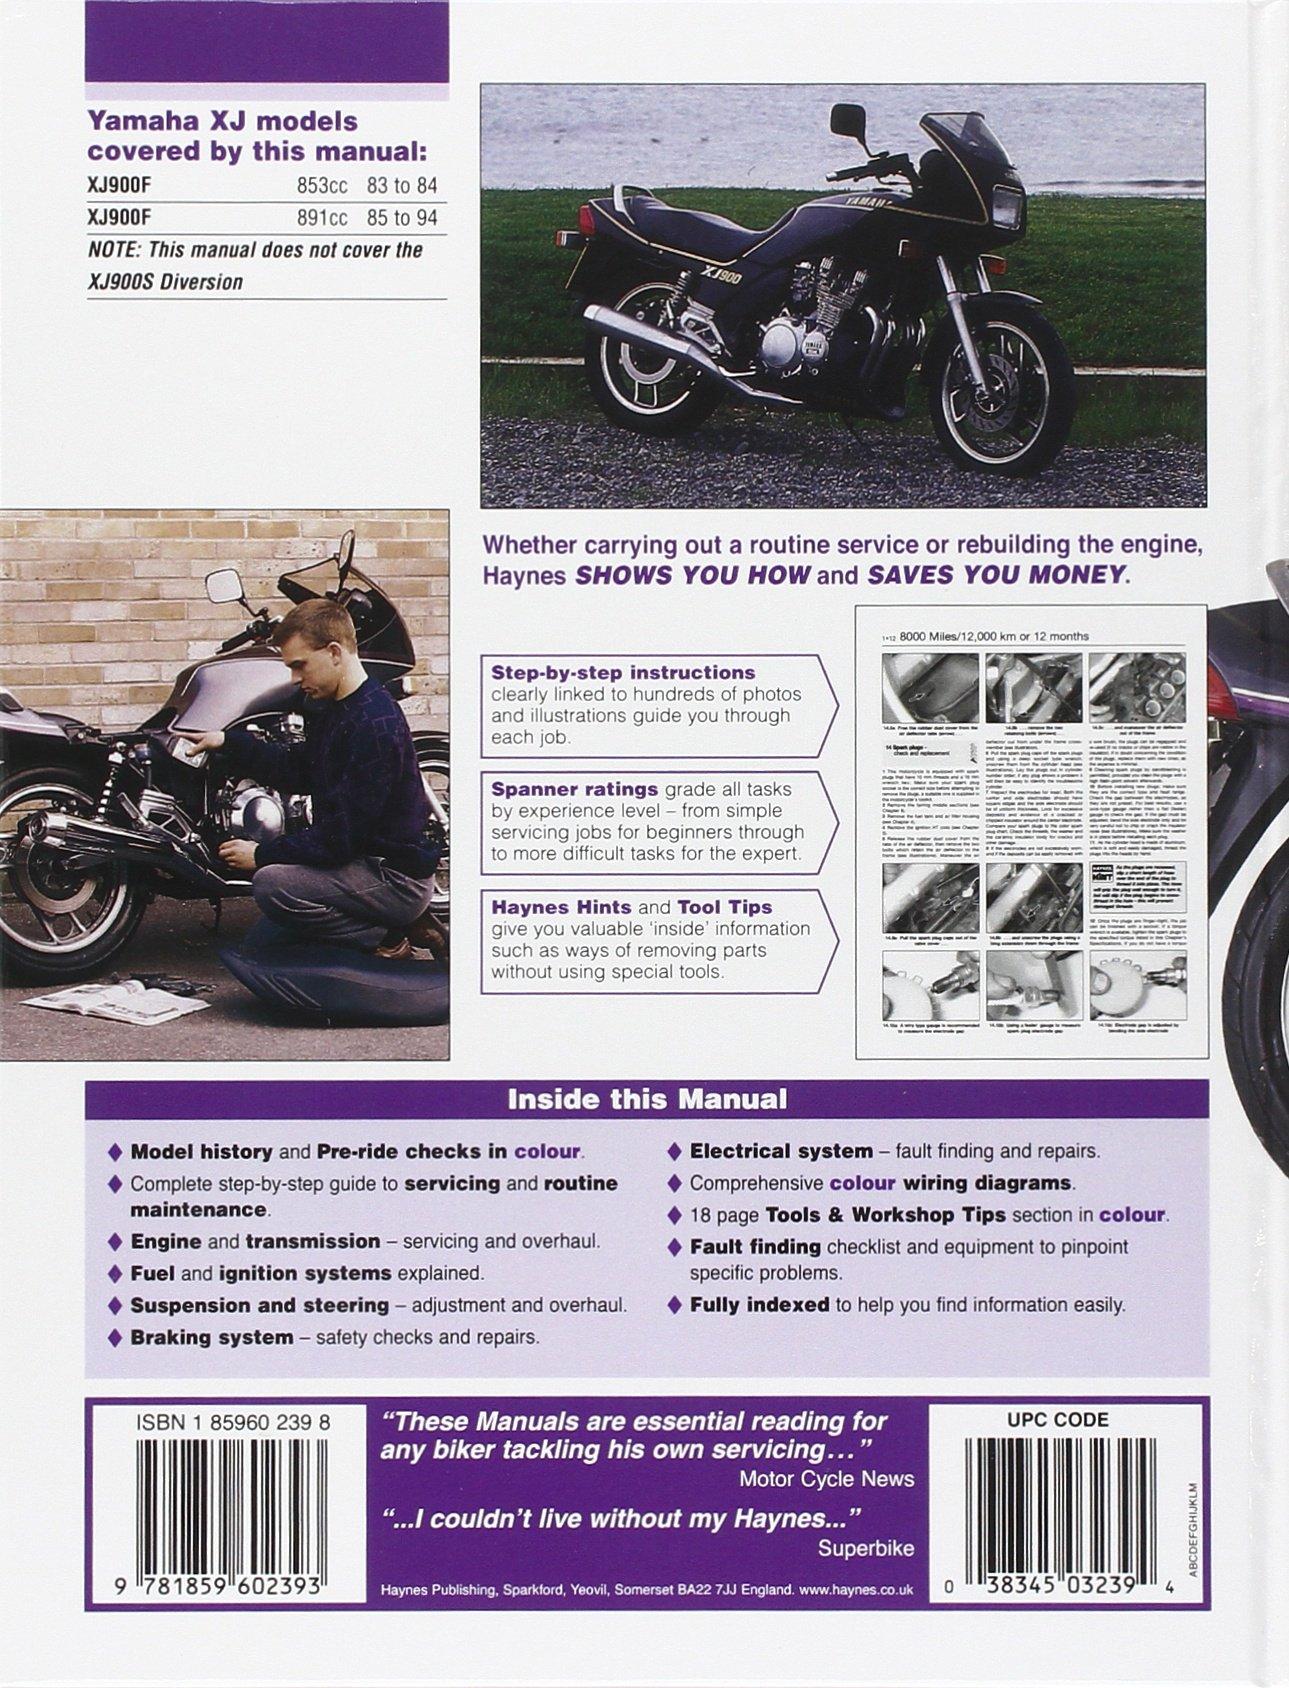 Yamaha Xj900f Fours Service And Repair Manual Haynes Reading Wiring Diagram Manuals Matthew Coombs 9781859602393 Books